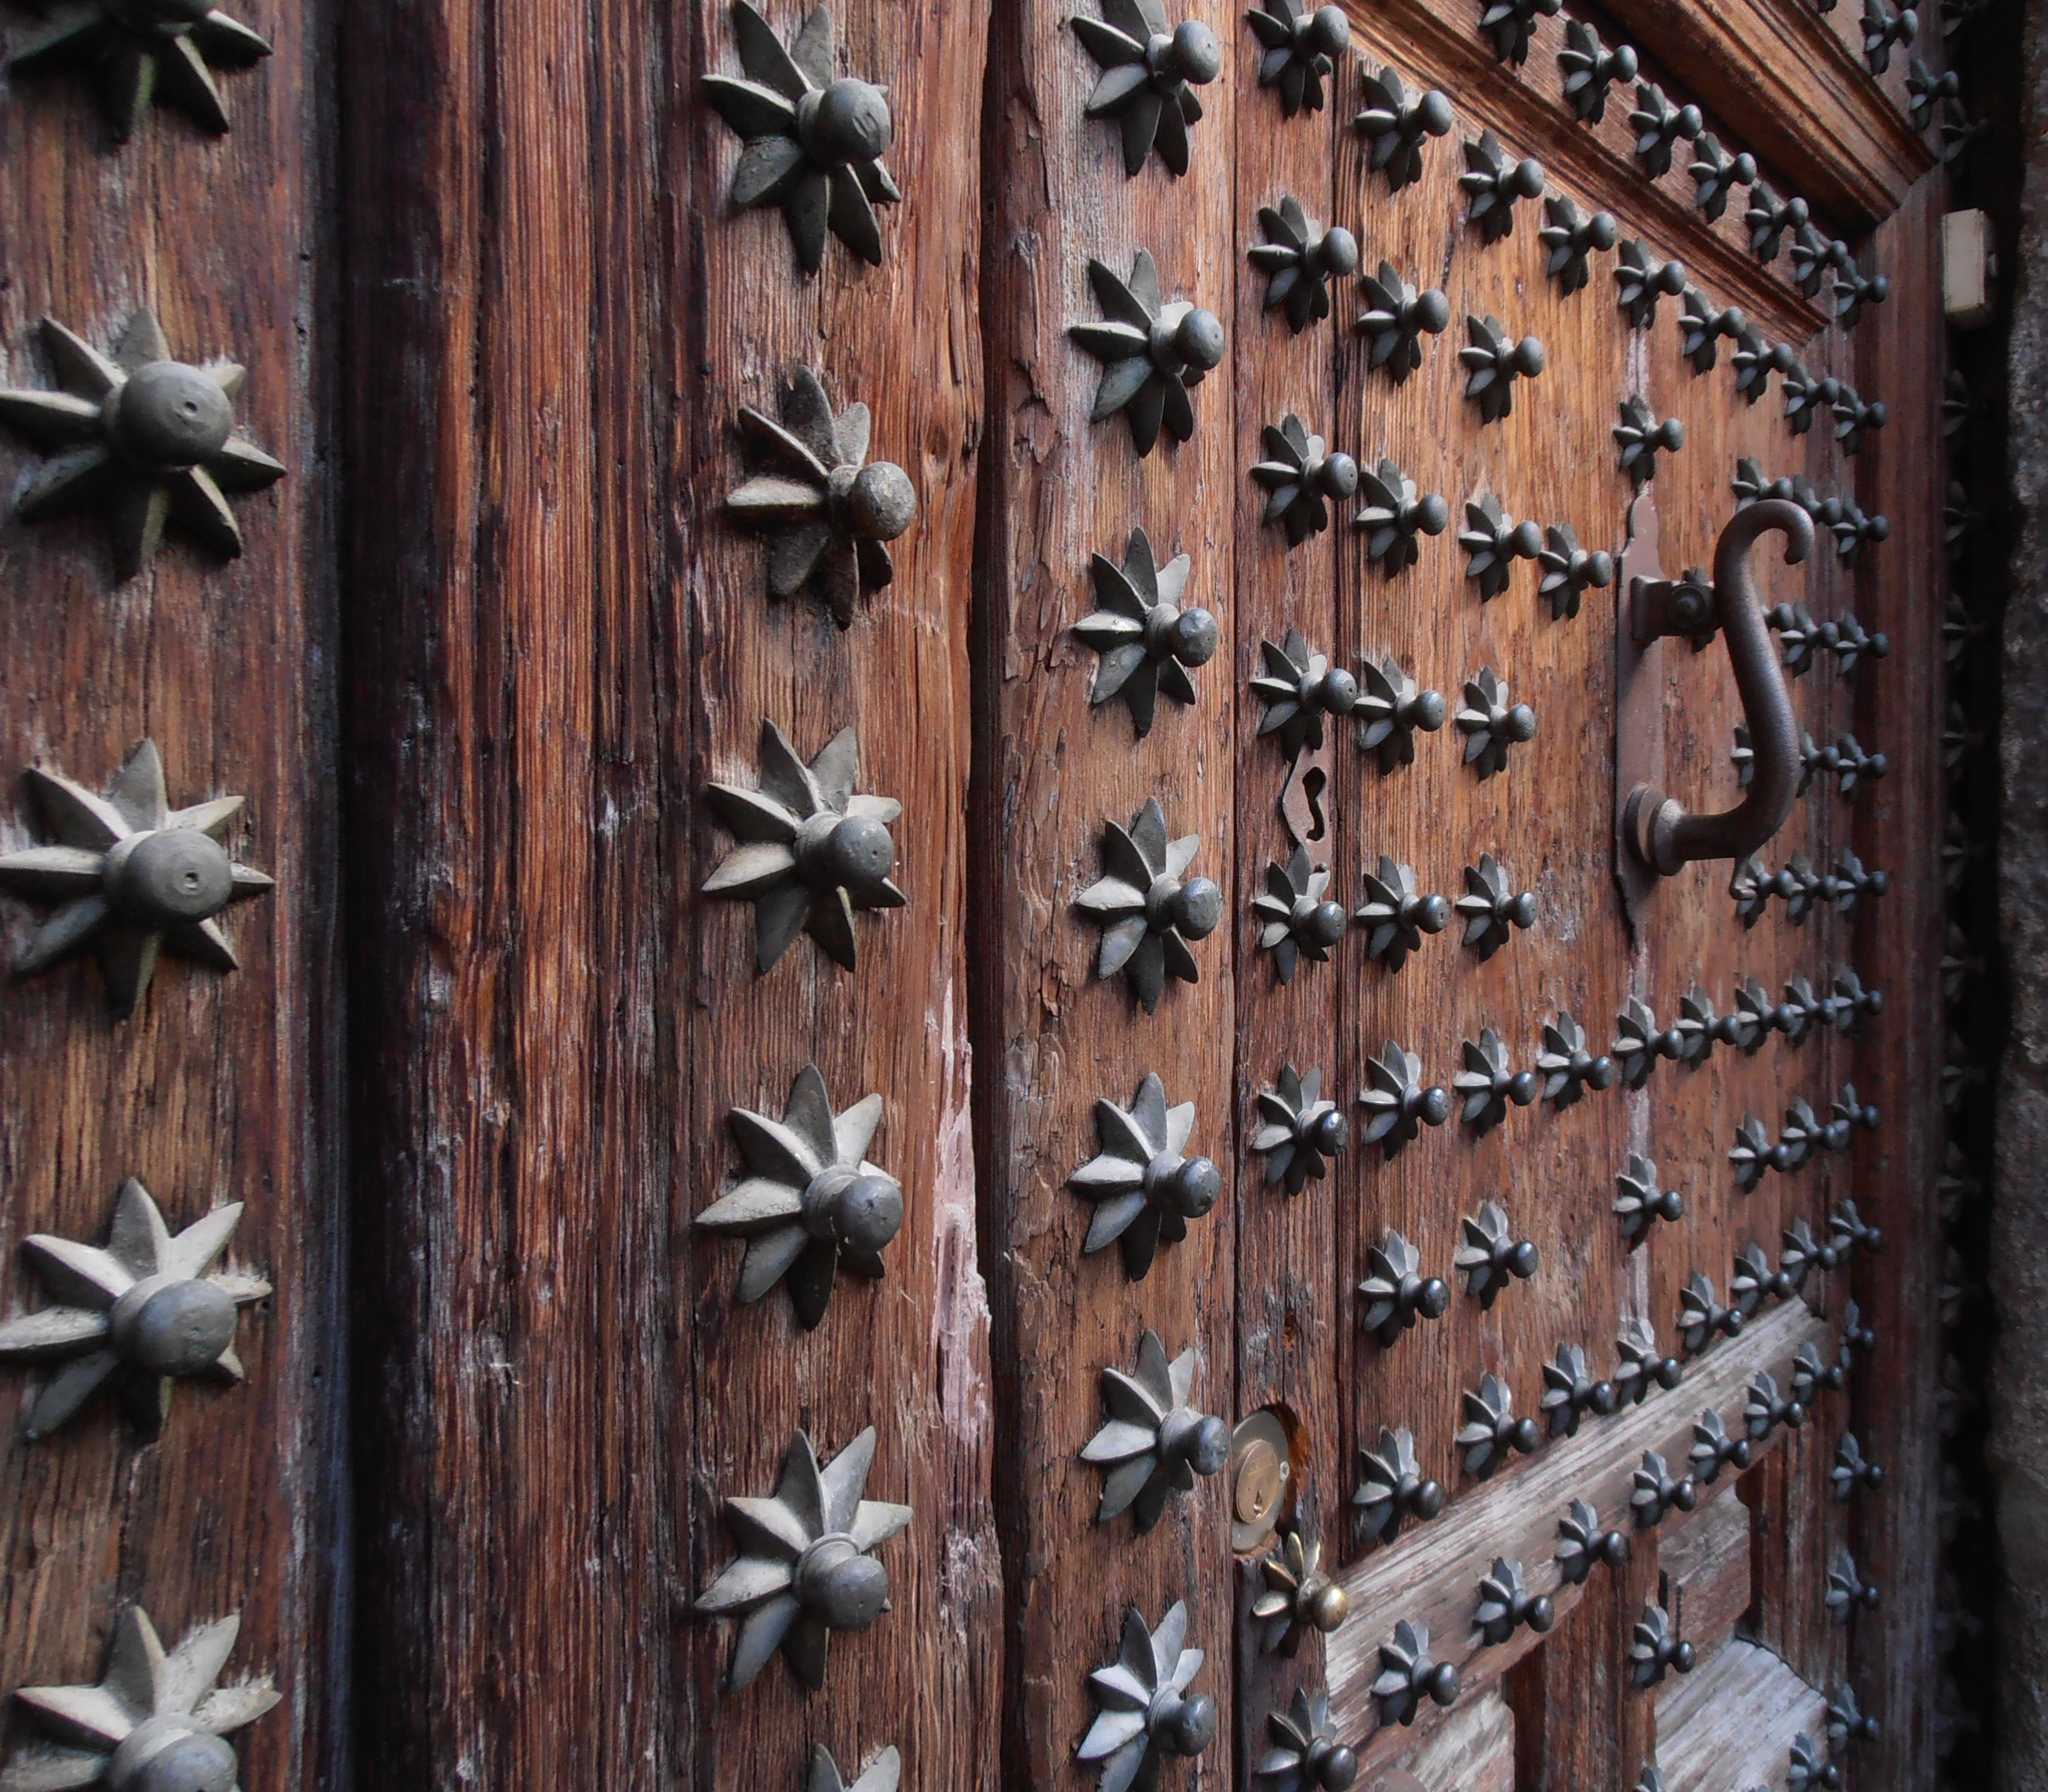 Starry starryu2026 door & The Amazing Doors of Toledo | Lady Of The Cakes pezcame.com